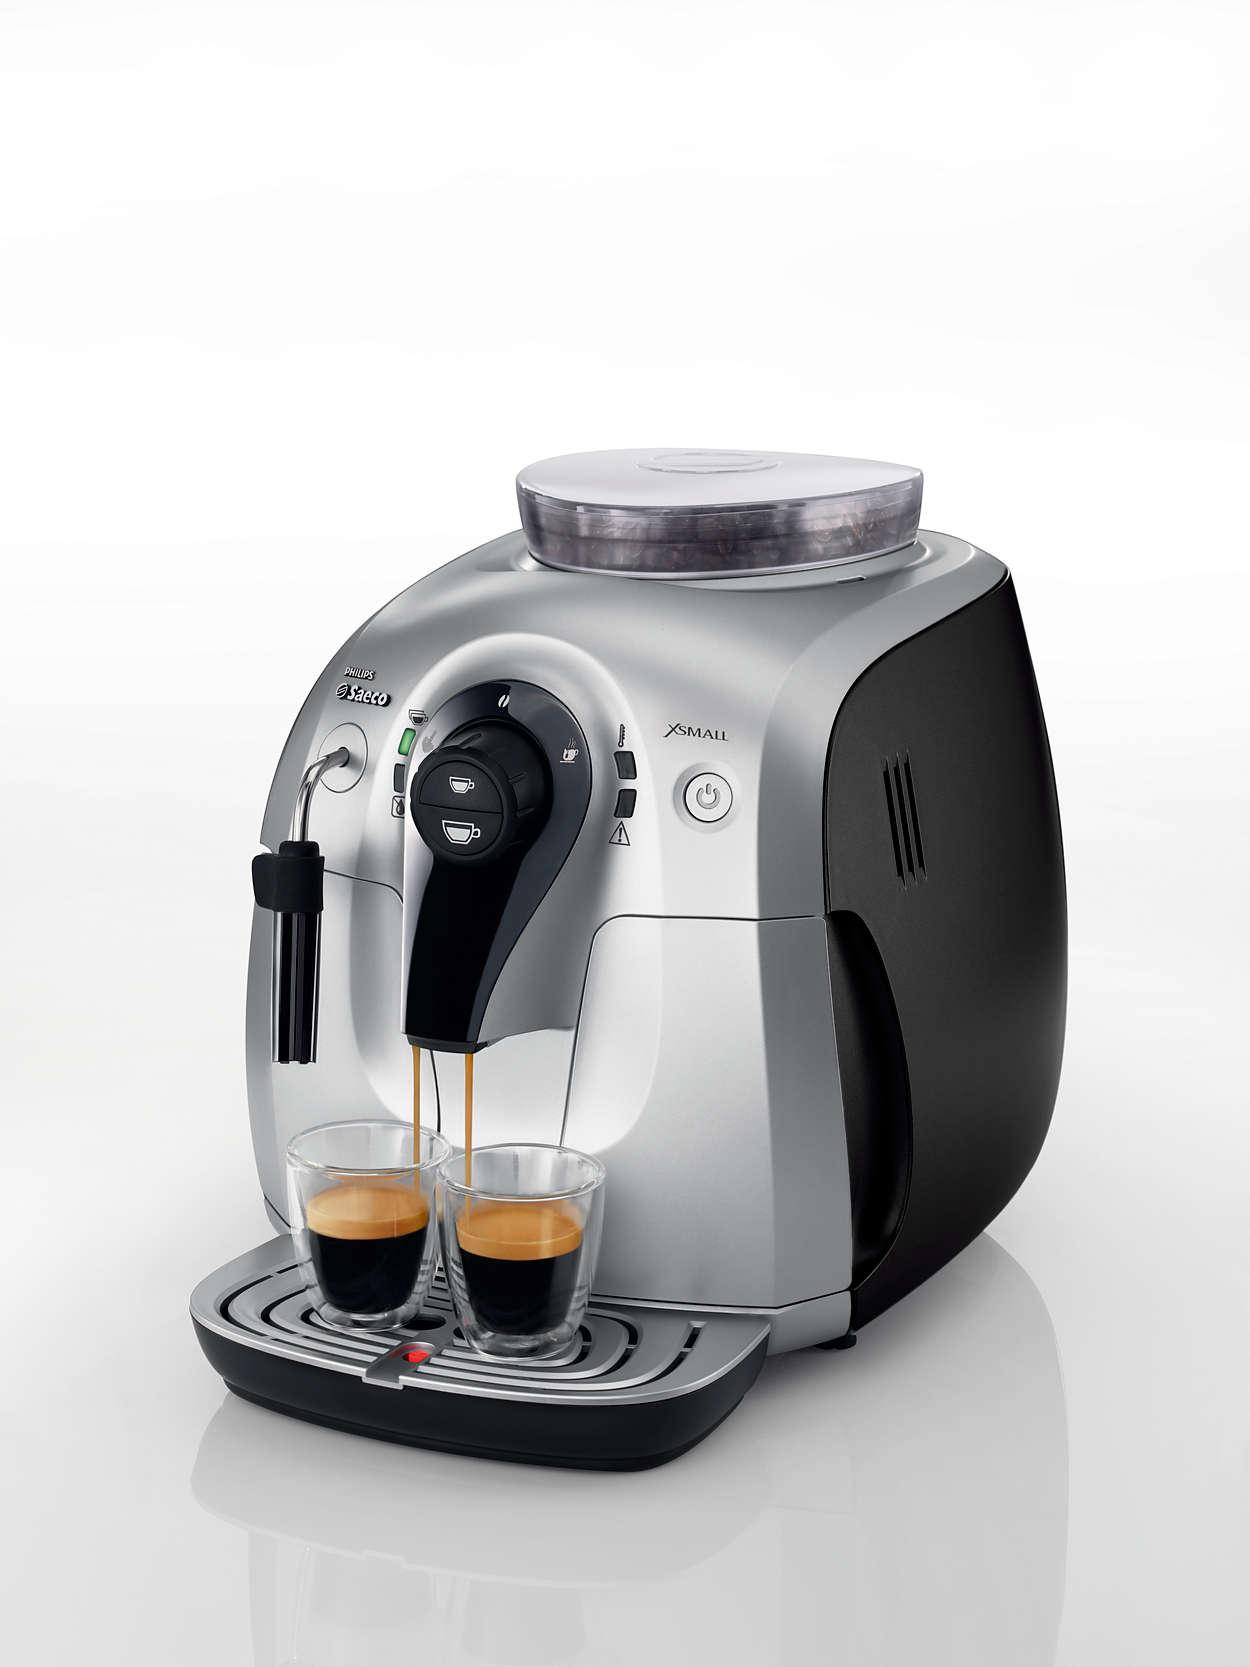 xsmall machine espresso super automatique hd8745 21 saeco. Black Bedroom Furniture Sets. Home Design Ideas